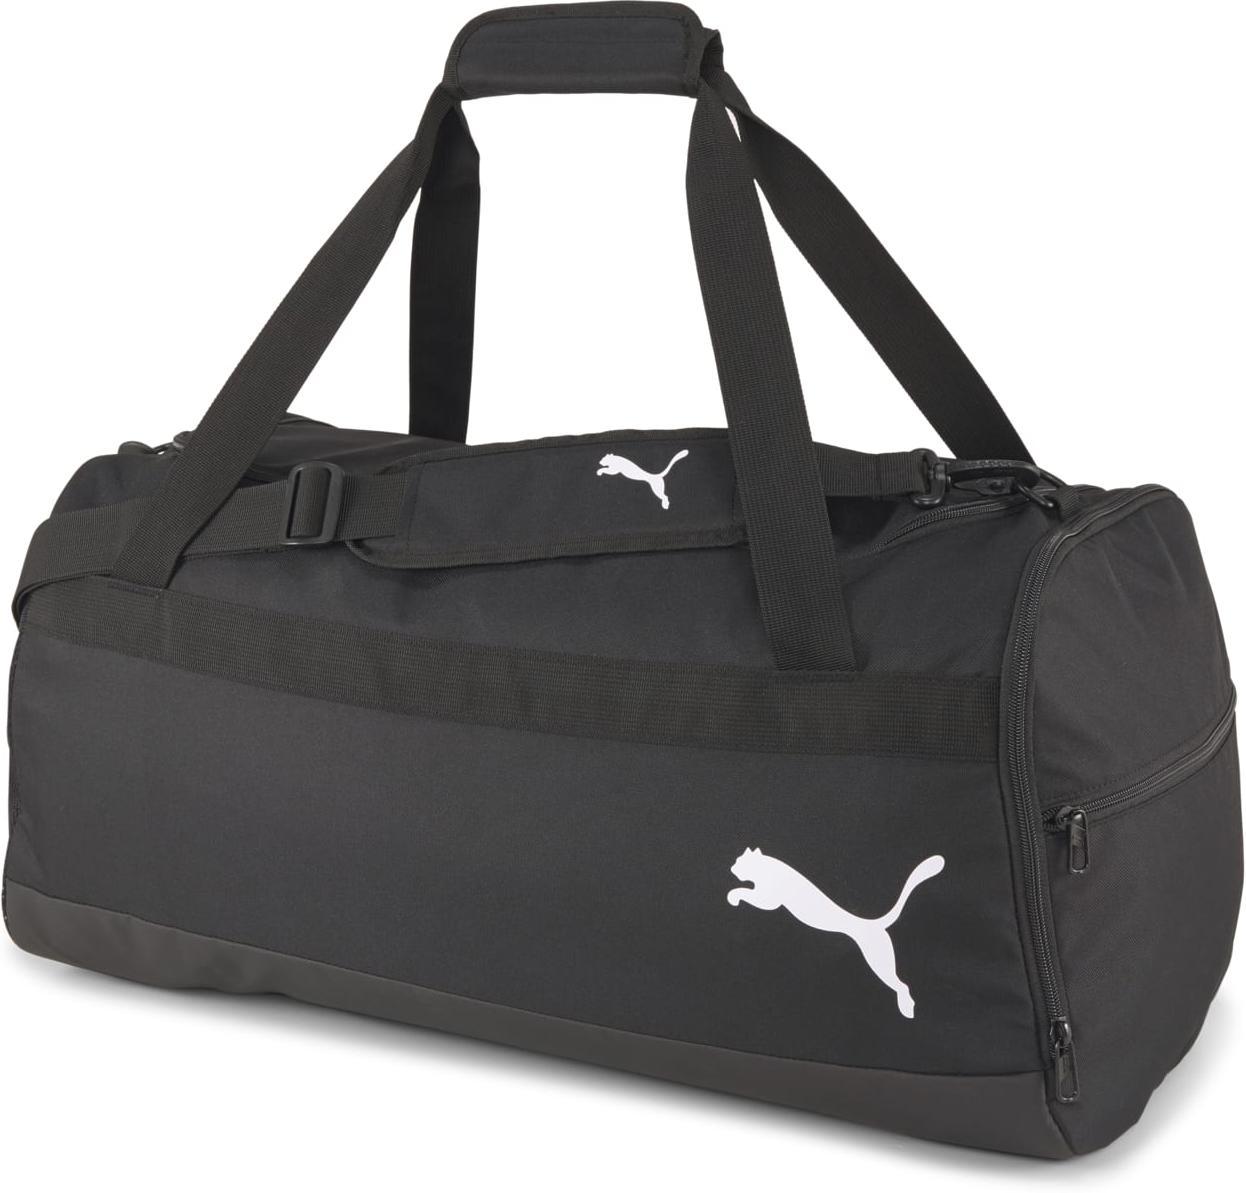 Puma teamGOAL 23 Teambag M Black Táskák